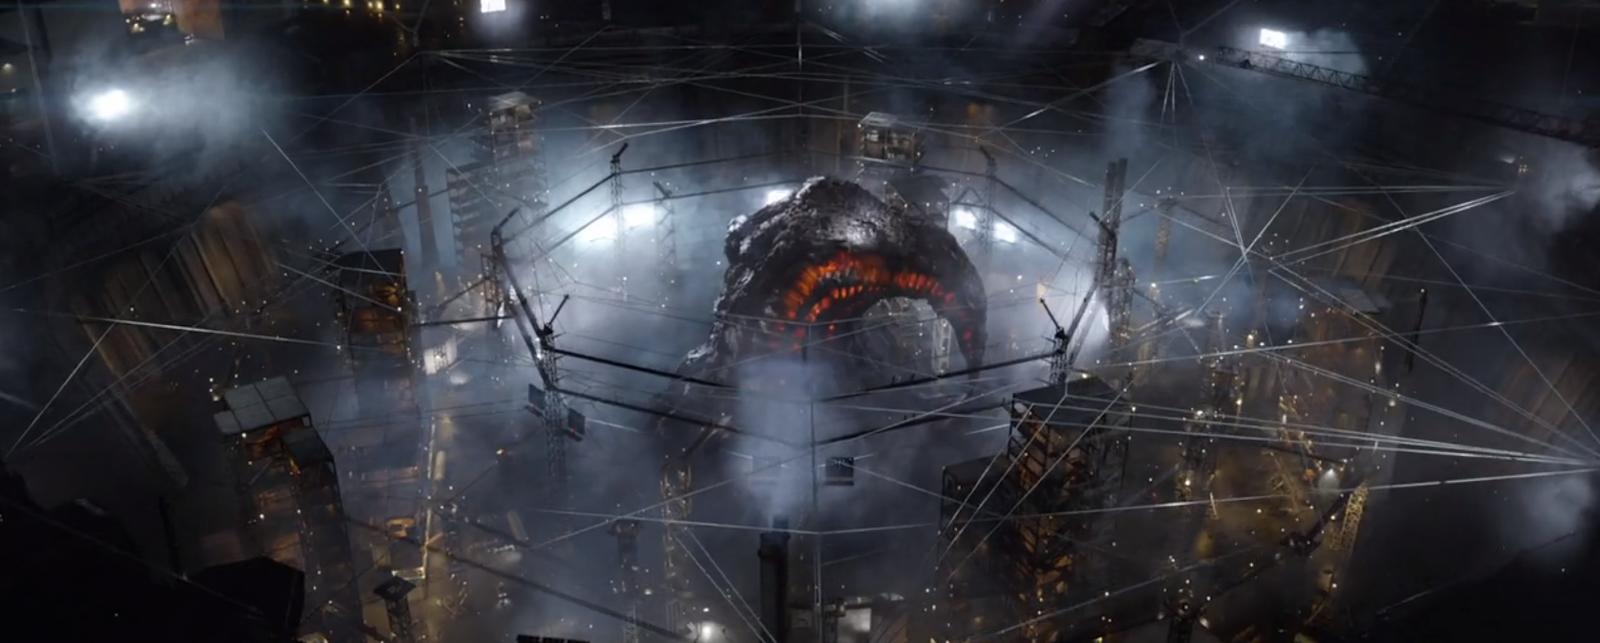 Video Godzilla 2014 New Movie Gambar Godzilla vs Muto